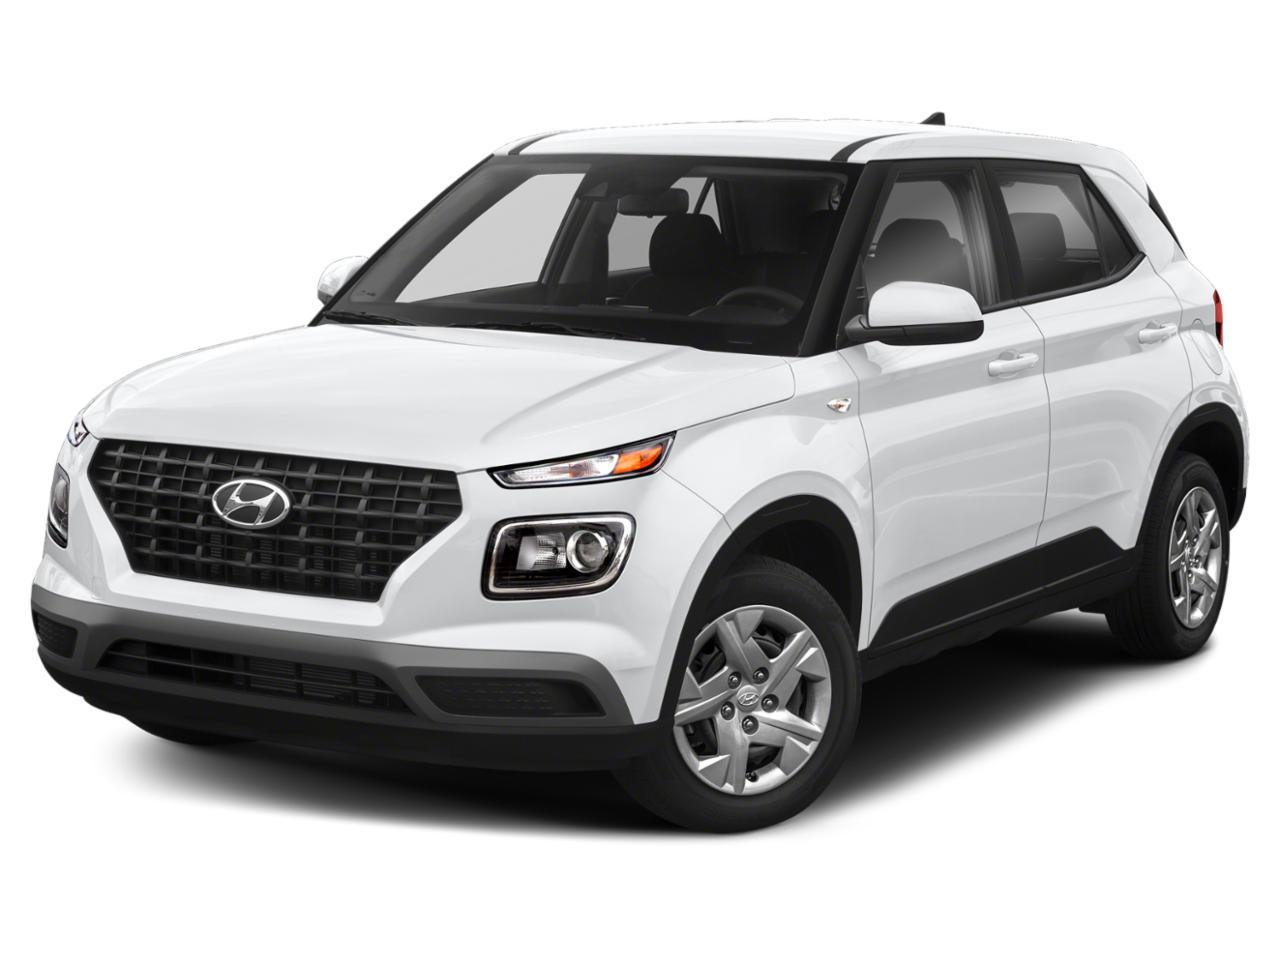 2020 Hyundai Venue Vehicle Photo in Appleton, WI 54913